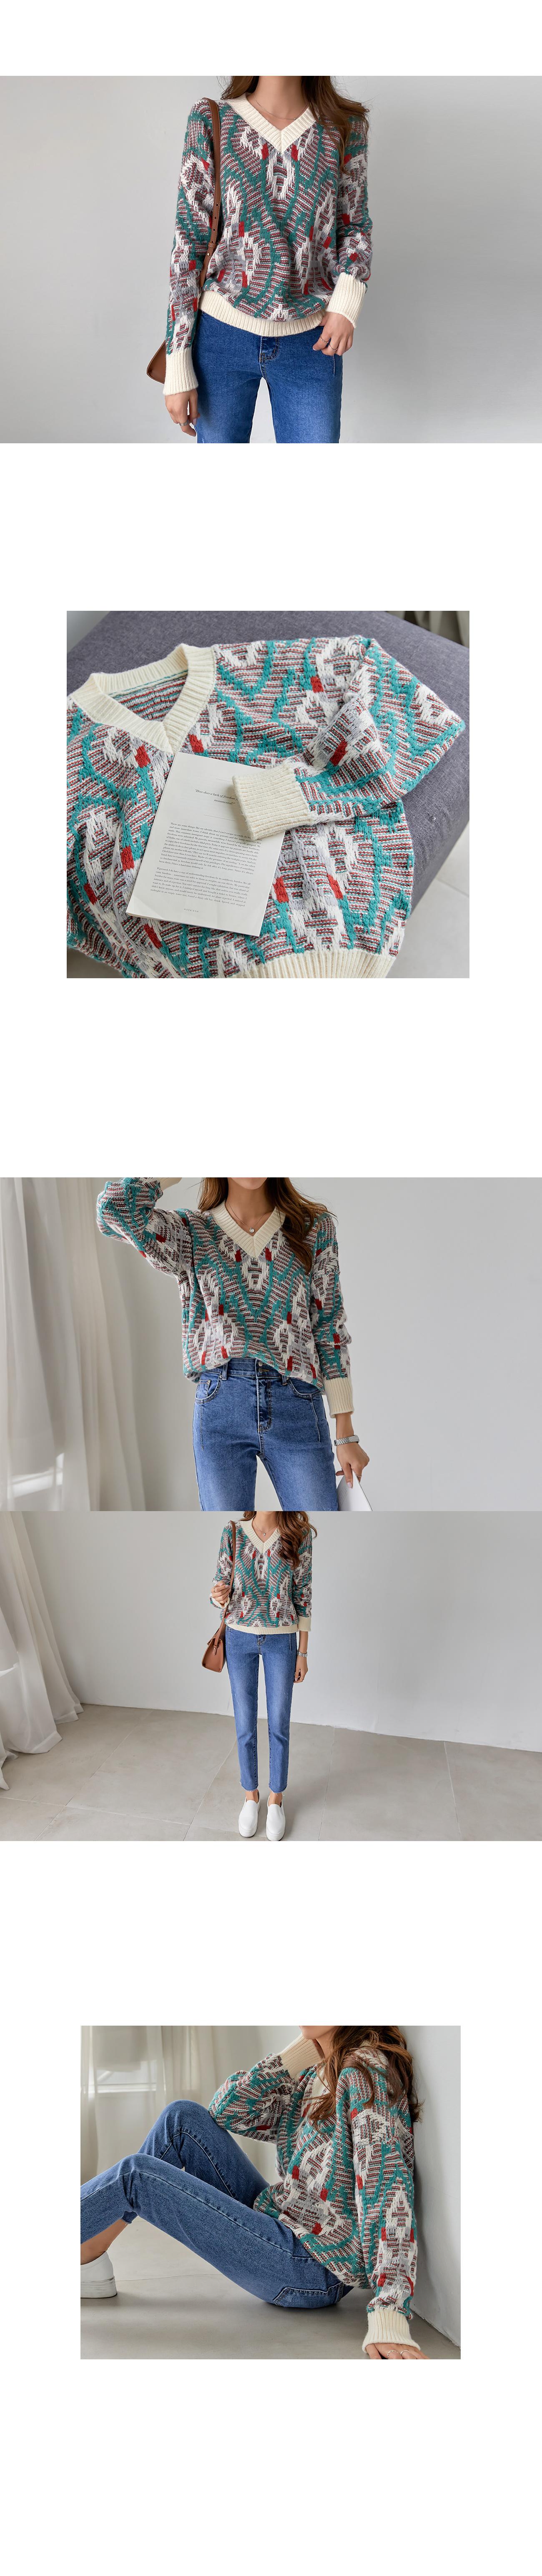 Ethnic Low Gauge Knit #108494